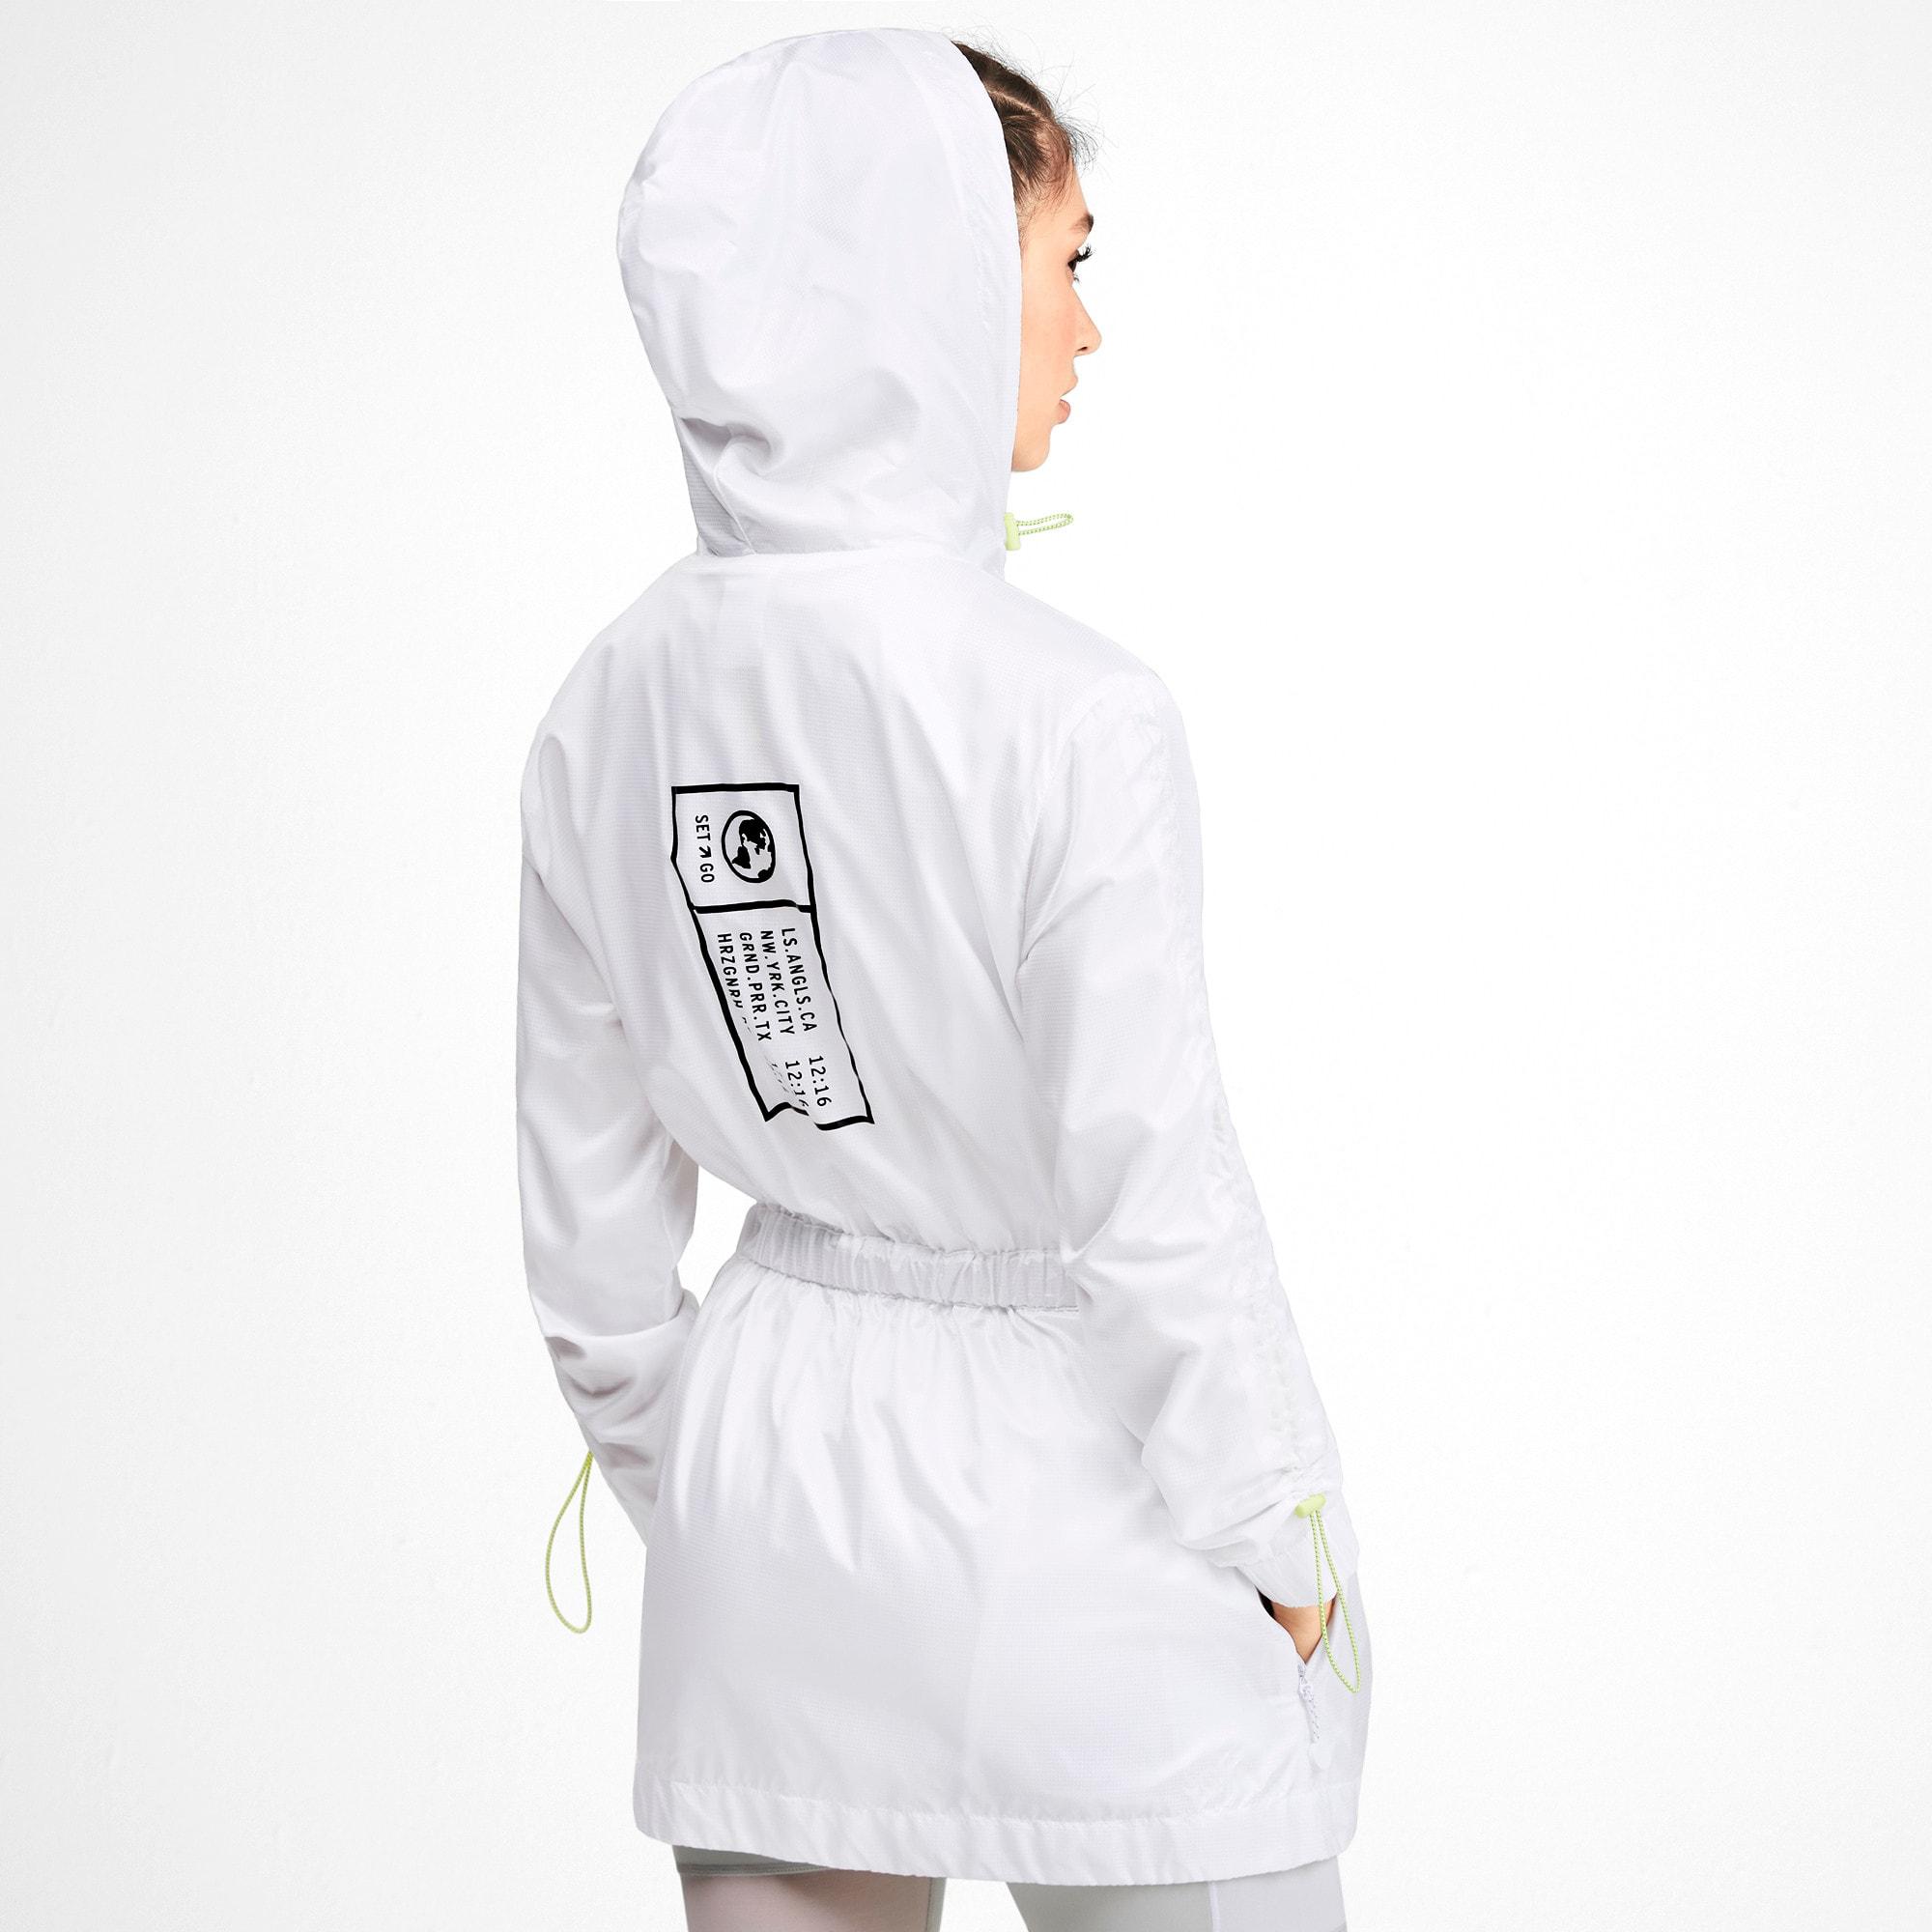 Thumbnail 2 of PUMA x SELENA GOMEZ Hooded Women's Jacket, Puma White, medium